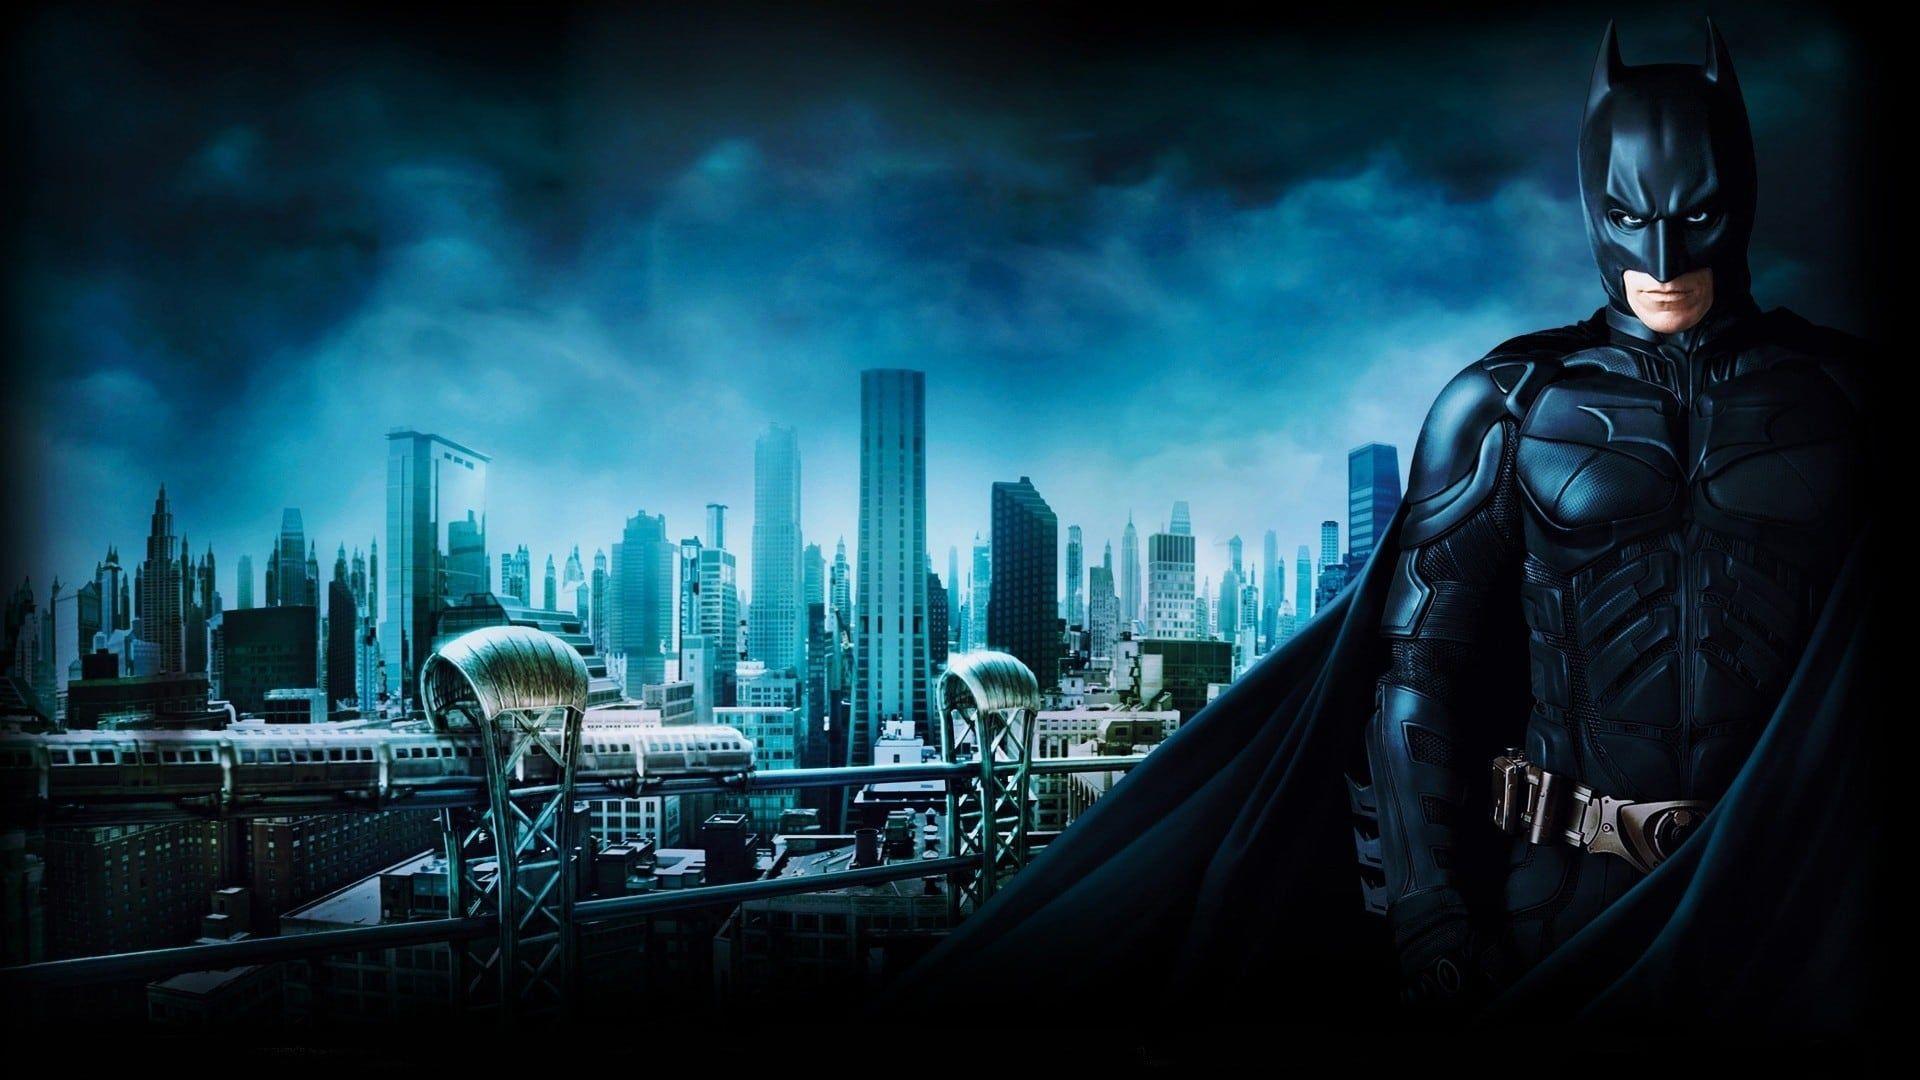 Batman Begins 2005 Streaming Ita Cb01 Film Completo Italiano